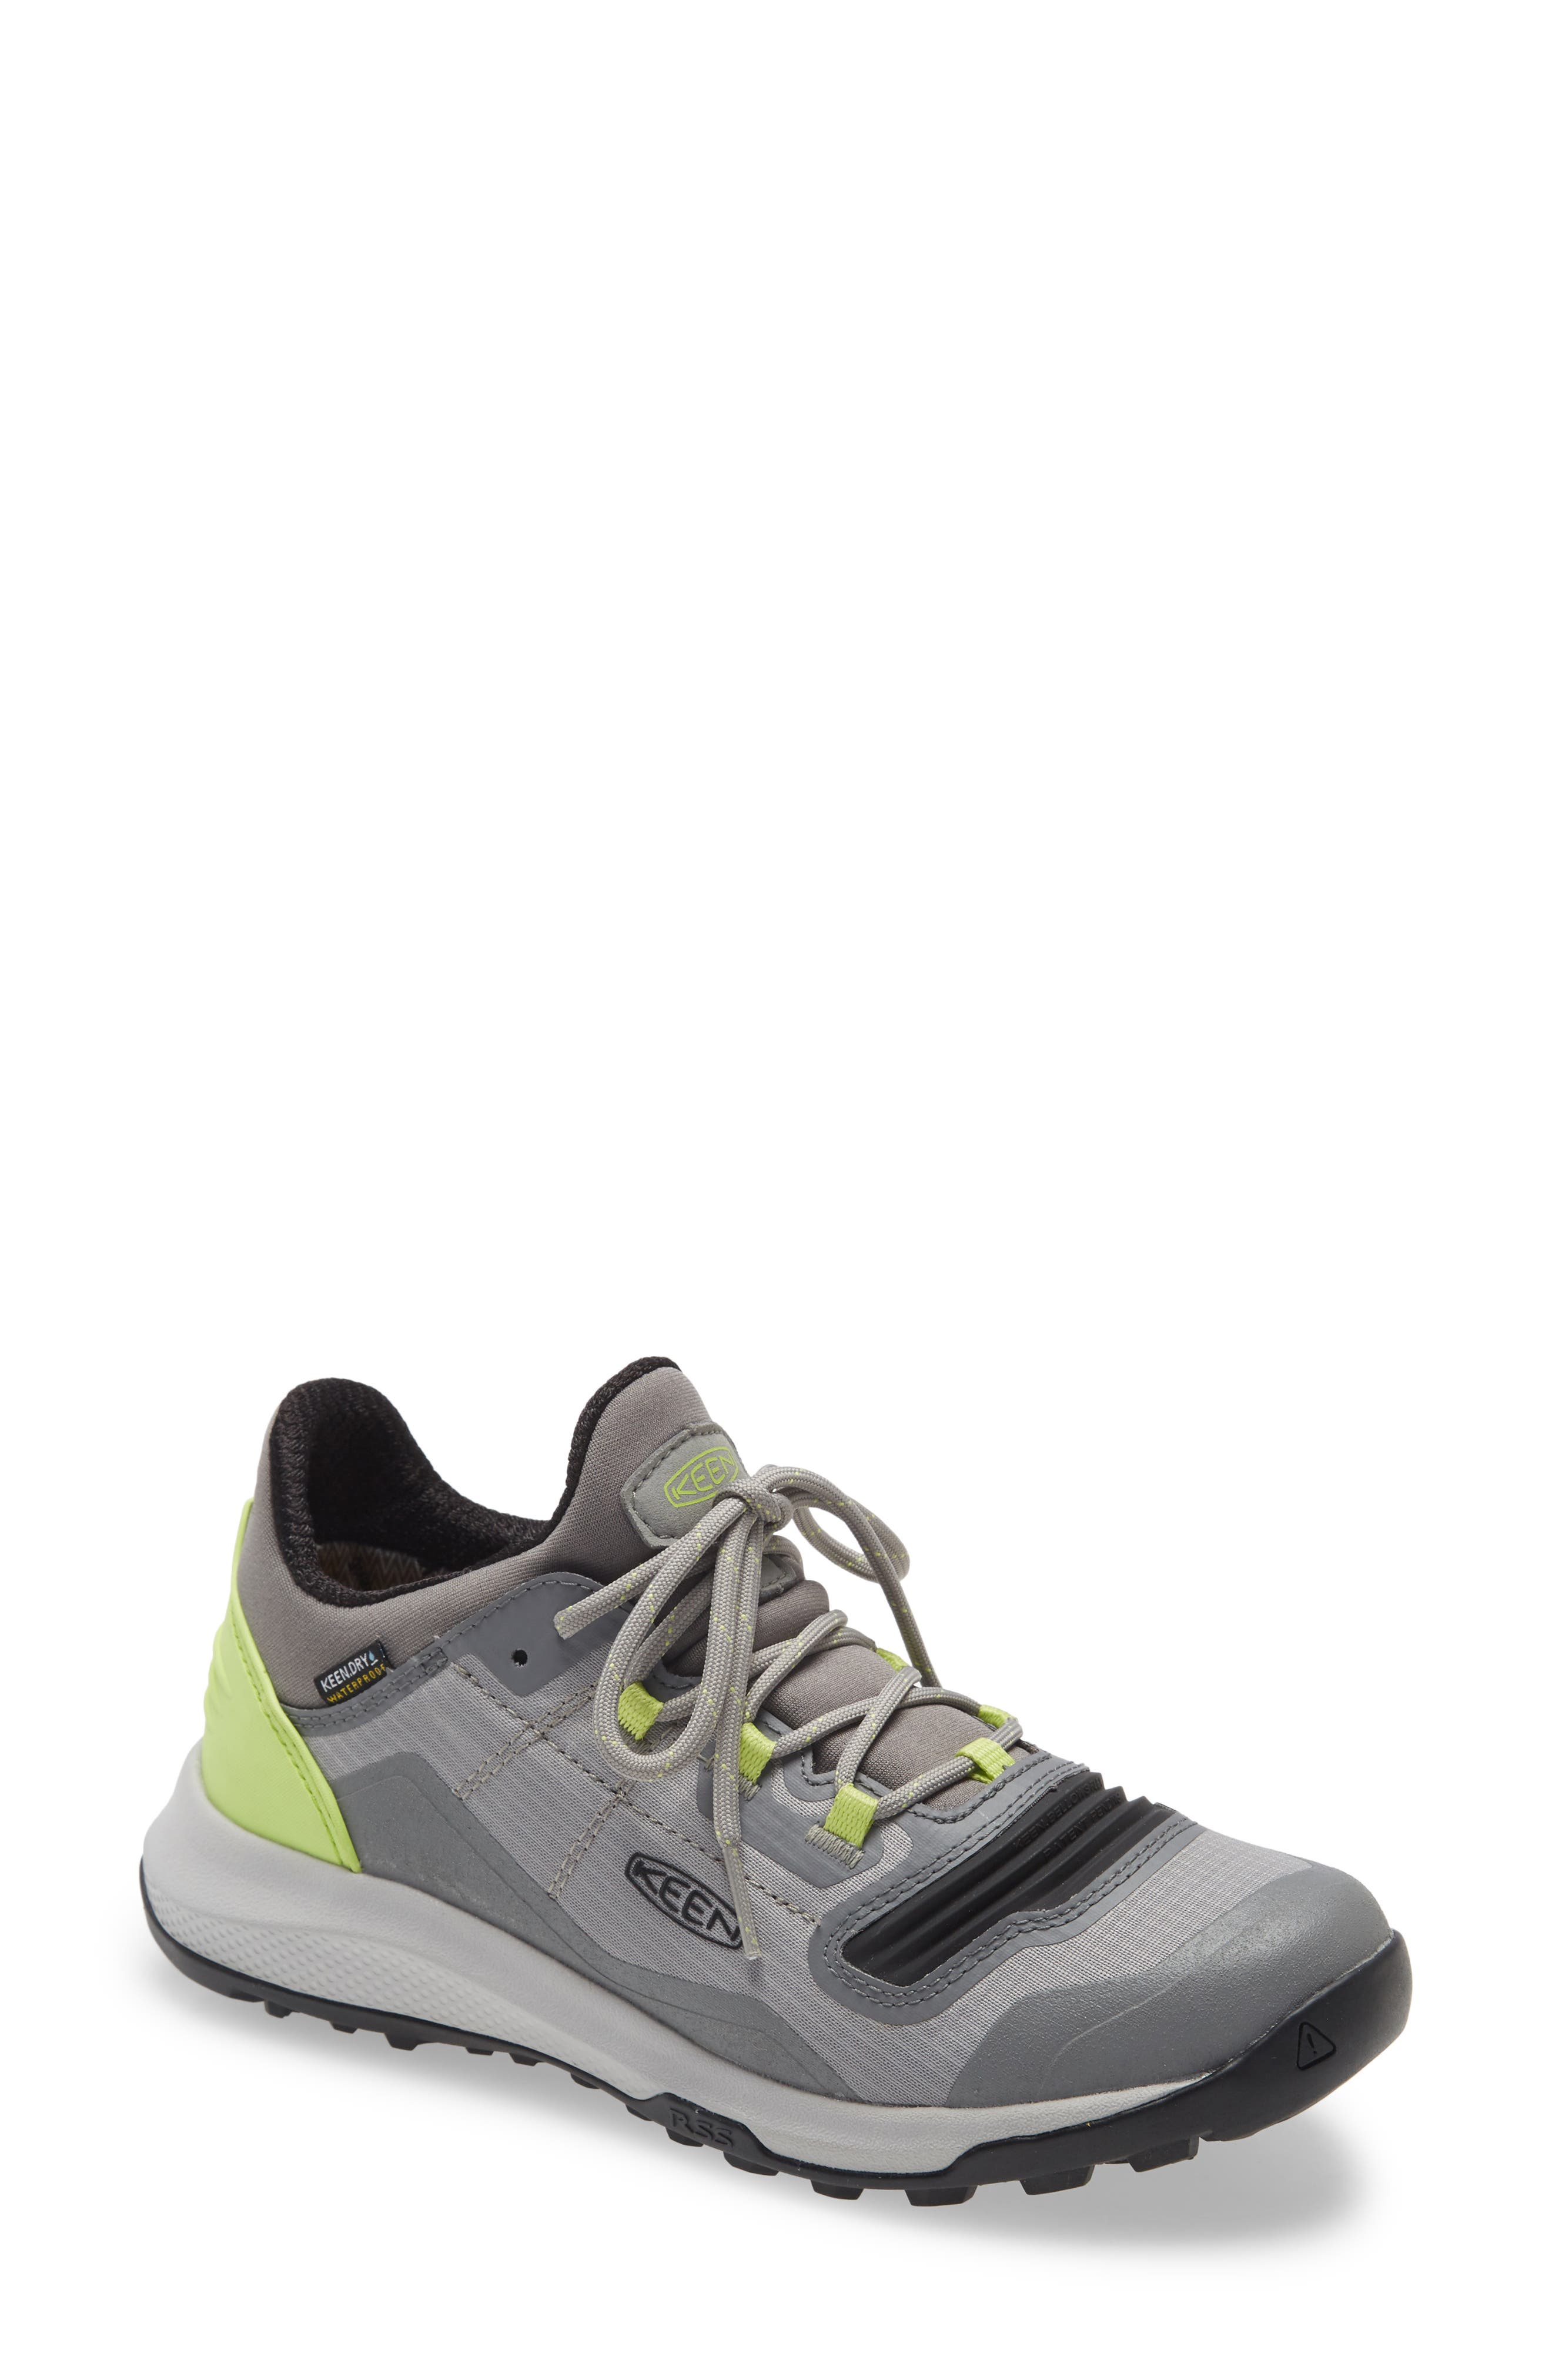 Tempo Flex Waterproof Hiking Shoe